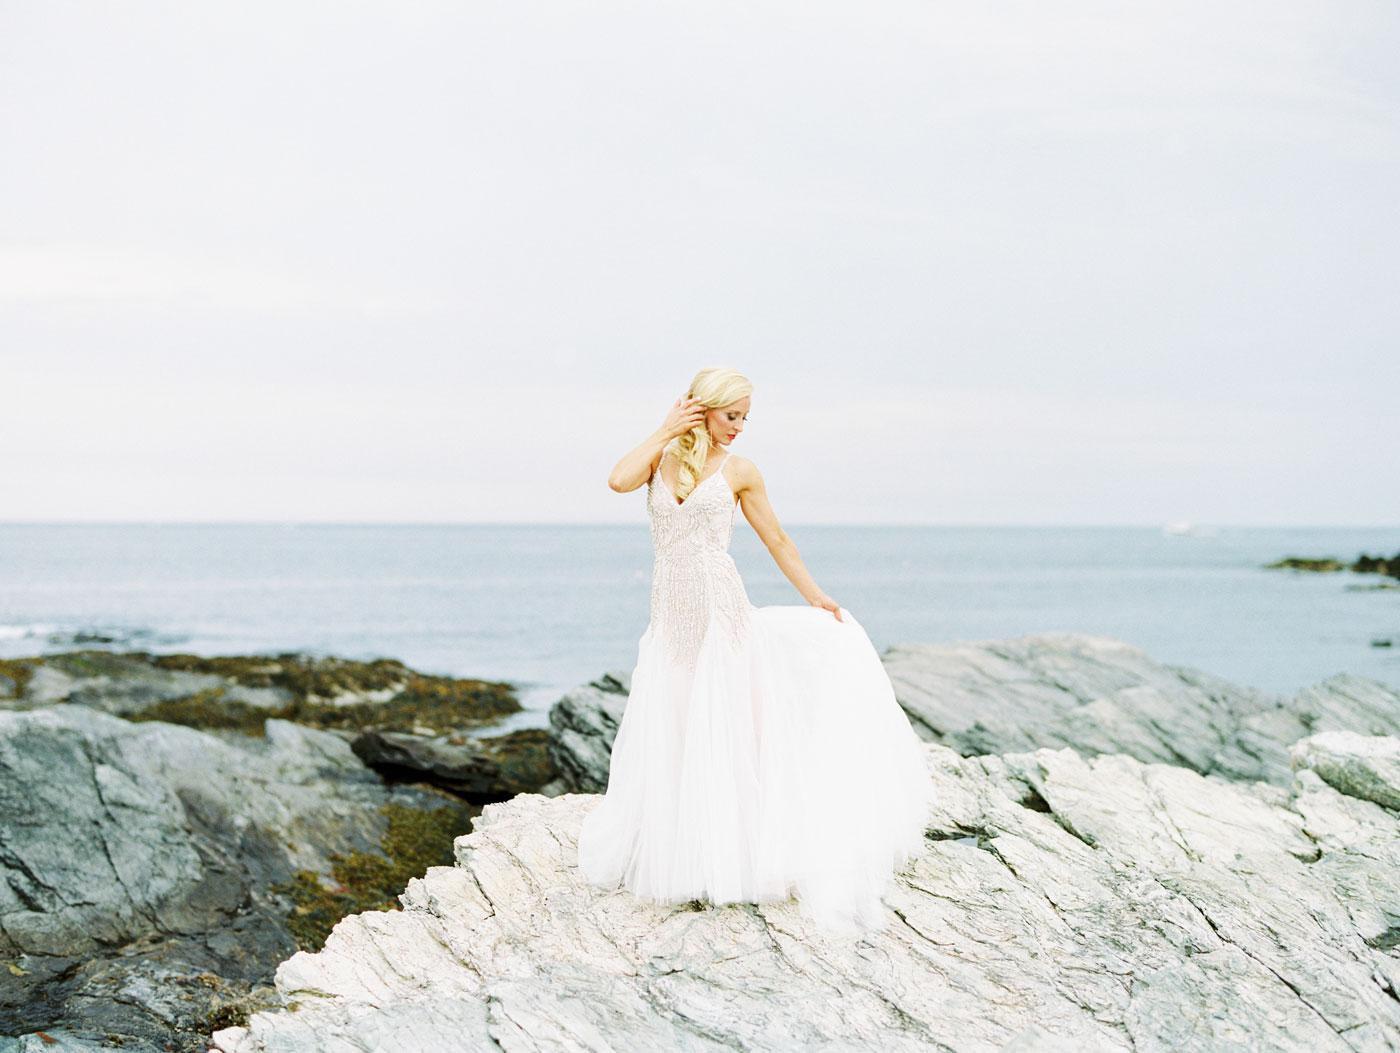 scenic bridal portrait at castle hill inn